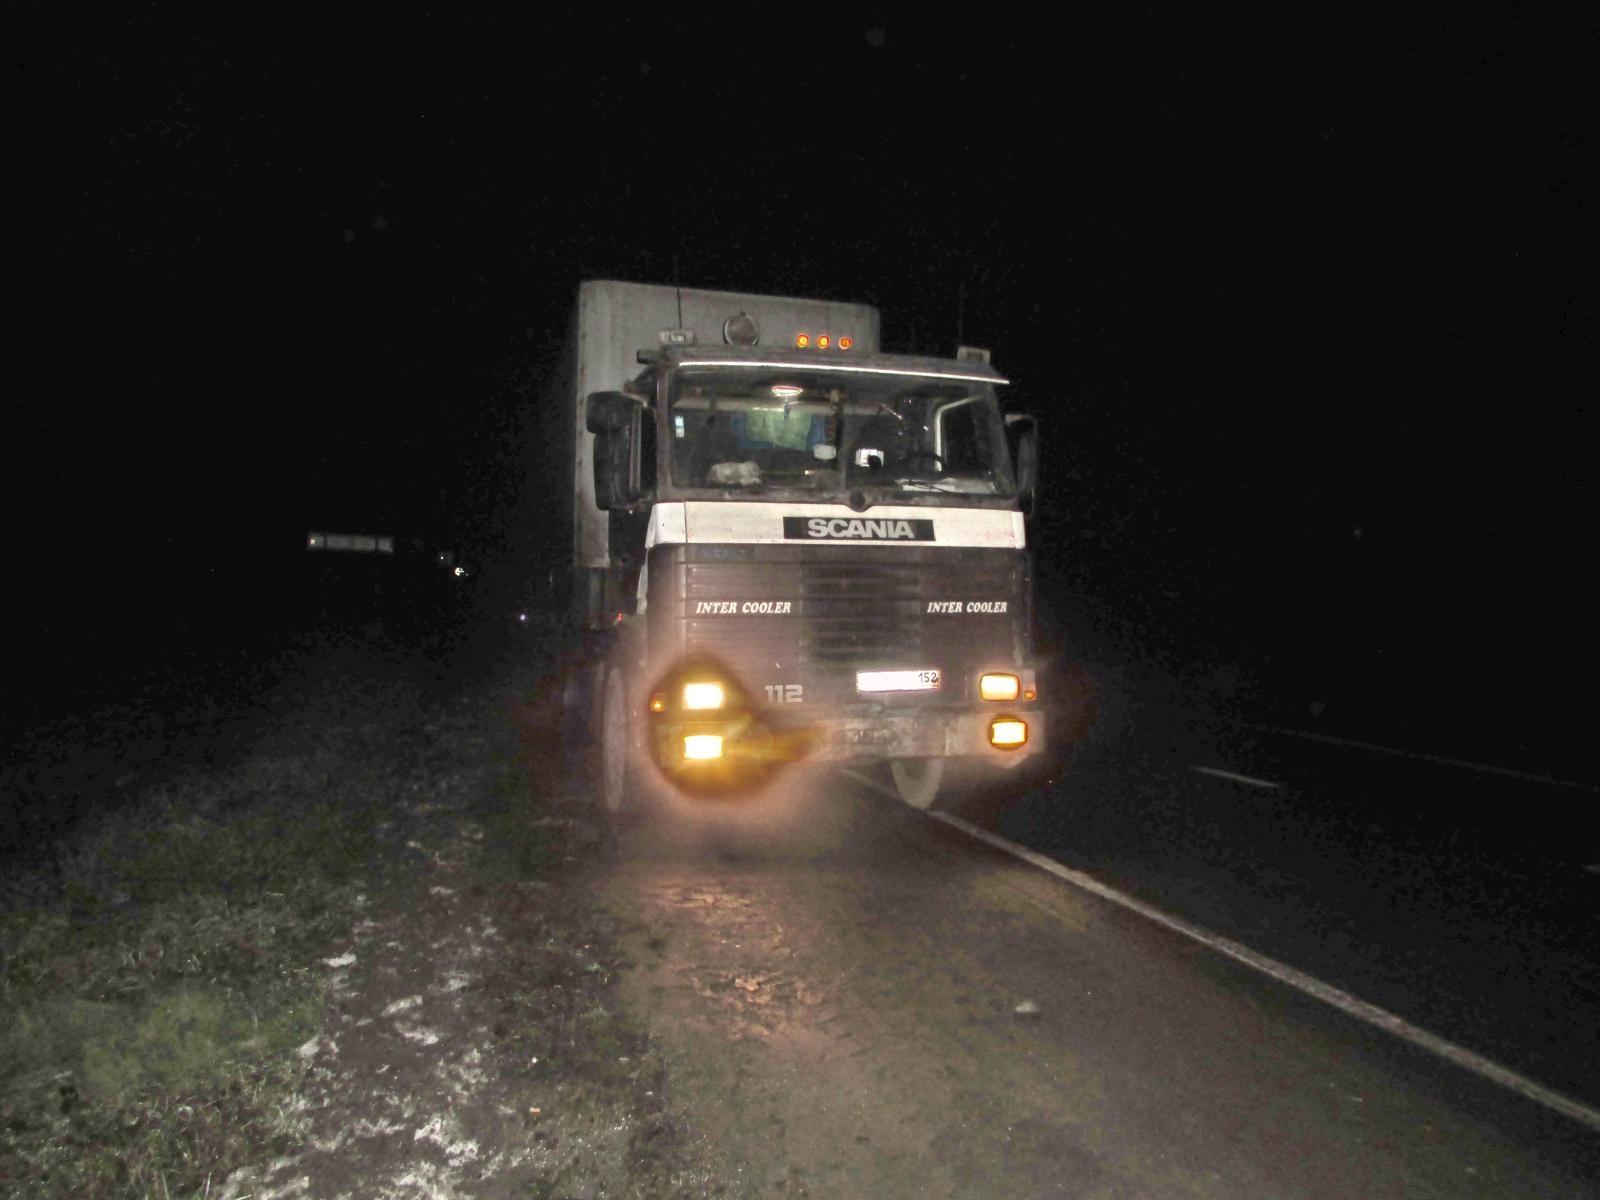 В Череповецком районе грузовик задавил мужчину, лежавшего на дороге